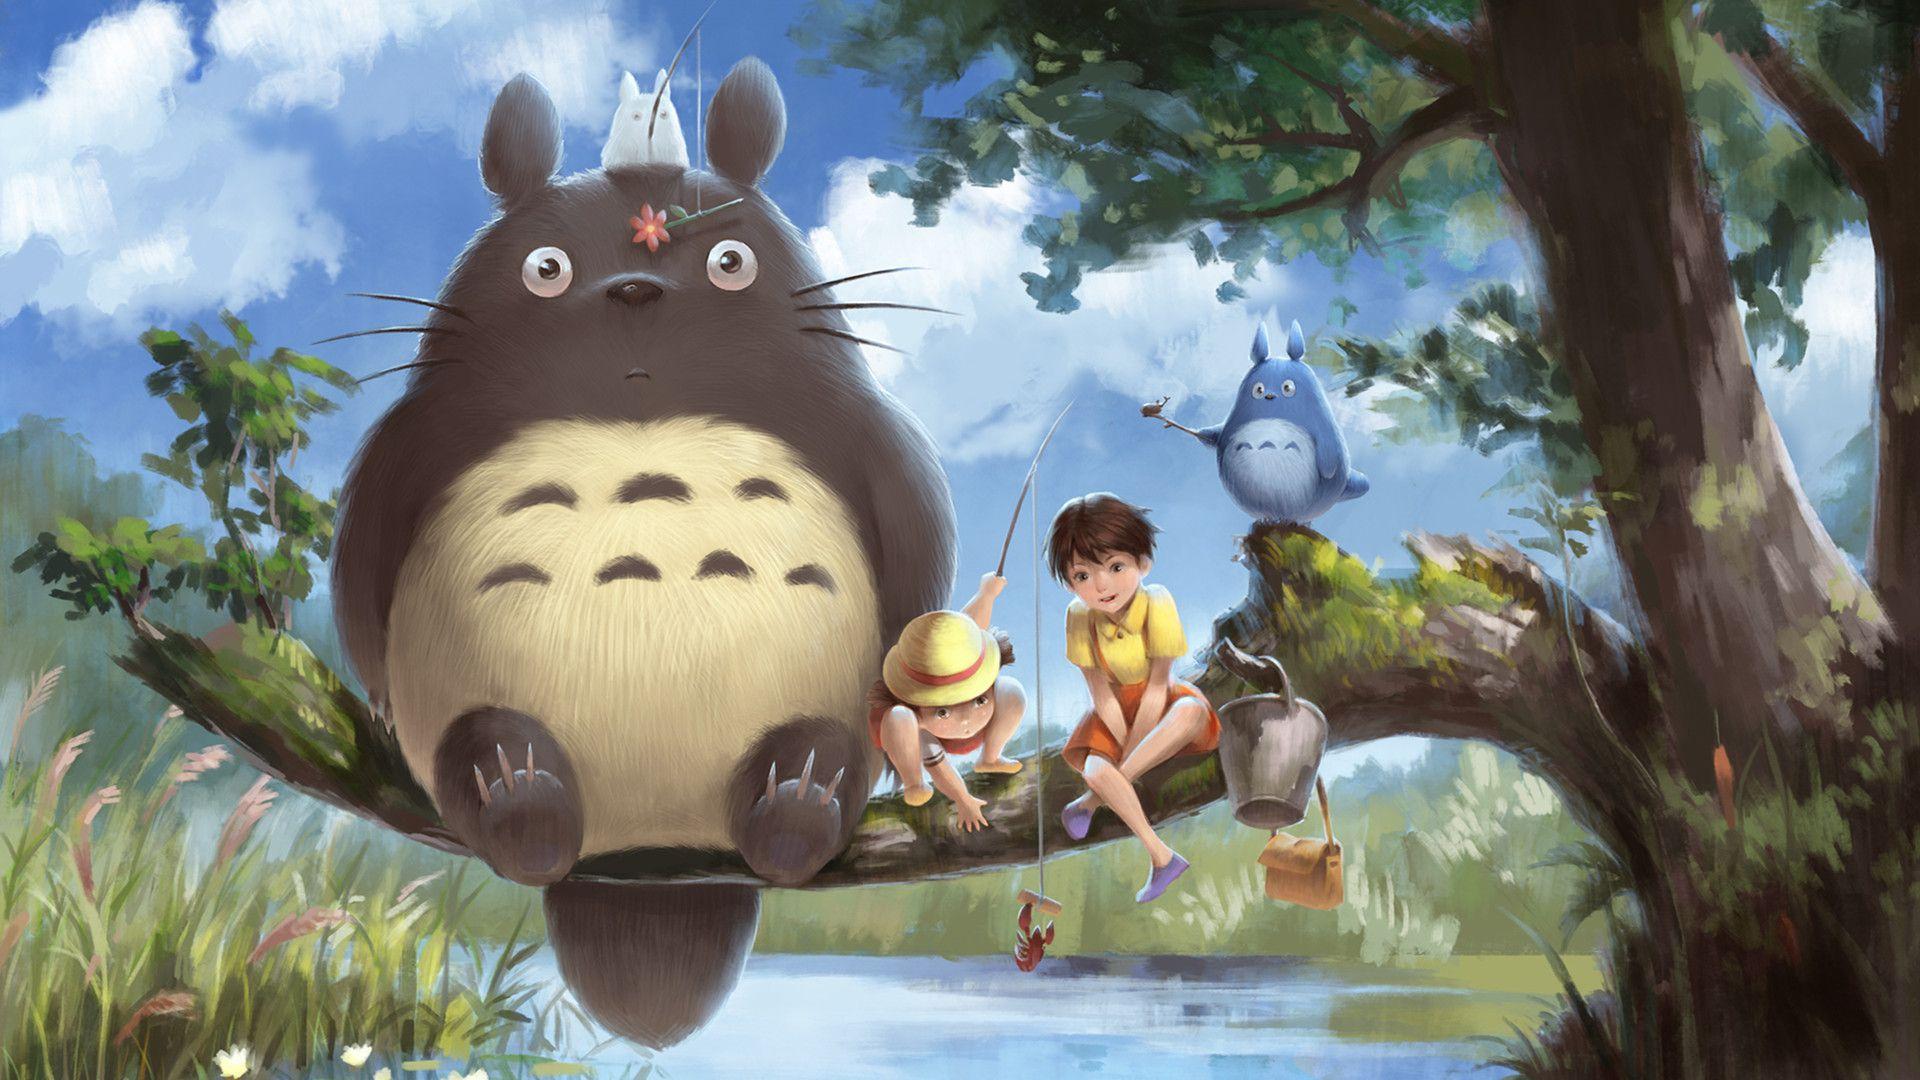 21 My Neighbor Totoro Wallpapers Wallpaperboat